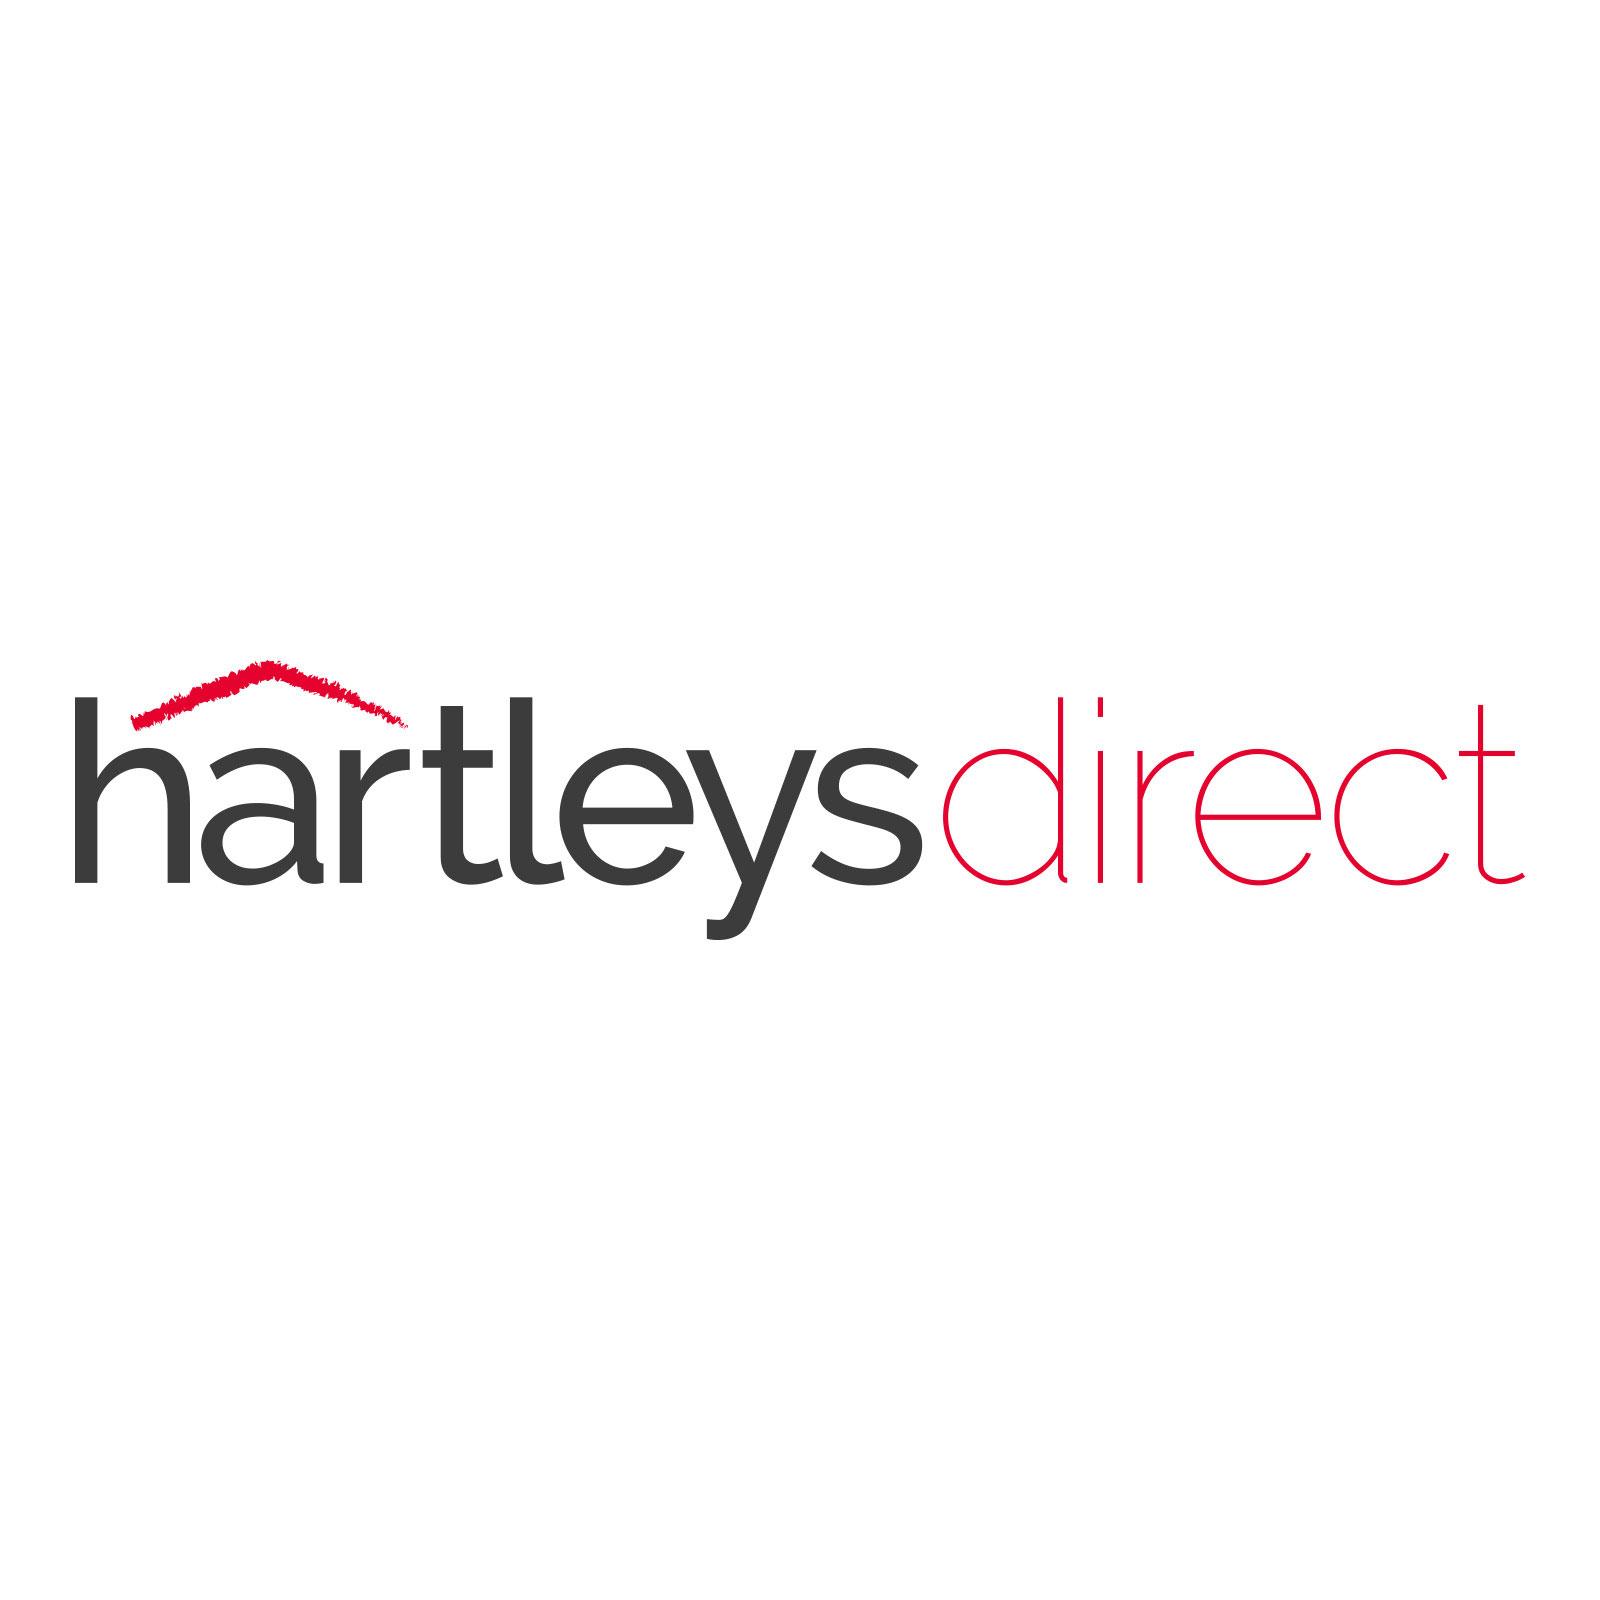 Hartleys-Black-Hairpin-Prism-Shelf-Brackets-on-White-Background.jpg